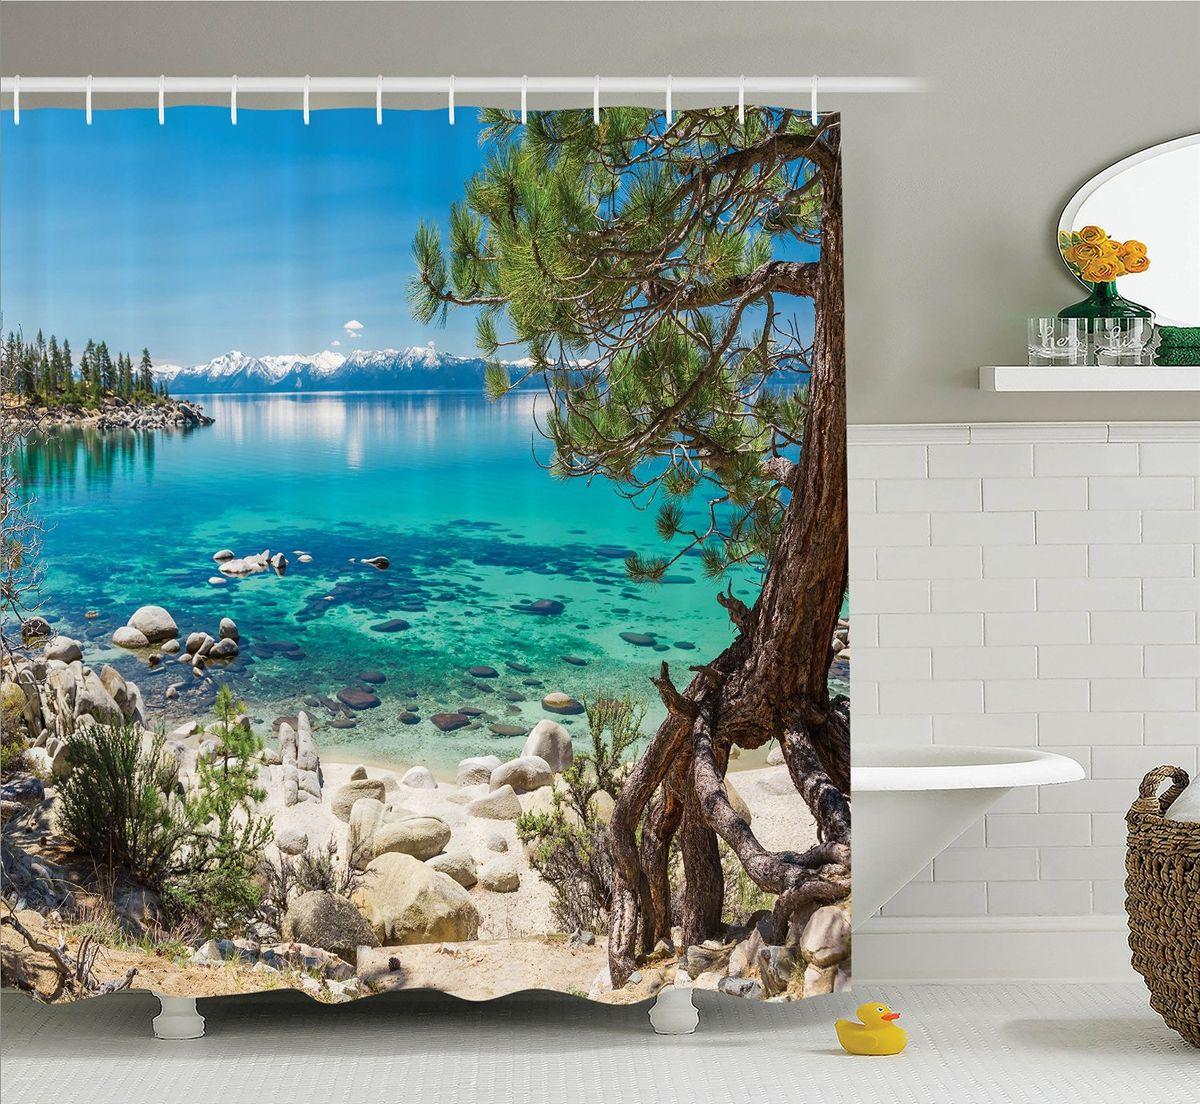 Штора для ванной комнаты Magic Lady Сосна на морском берегу, 180 х 200 см штора для ванной комнаты magic lady сакура на фоне гор 180 х 200 см